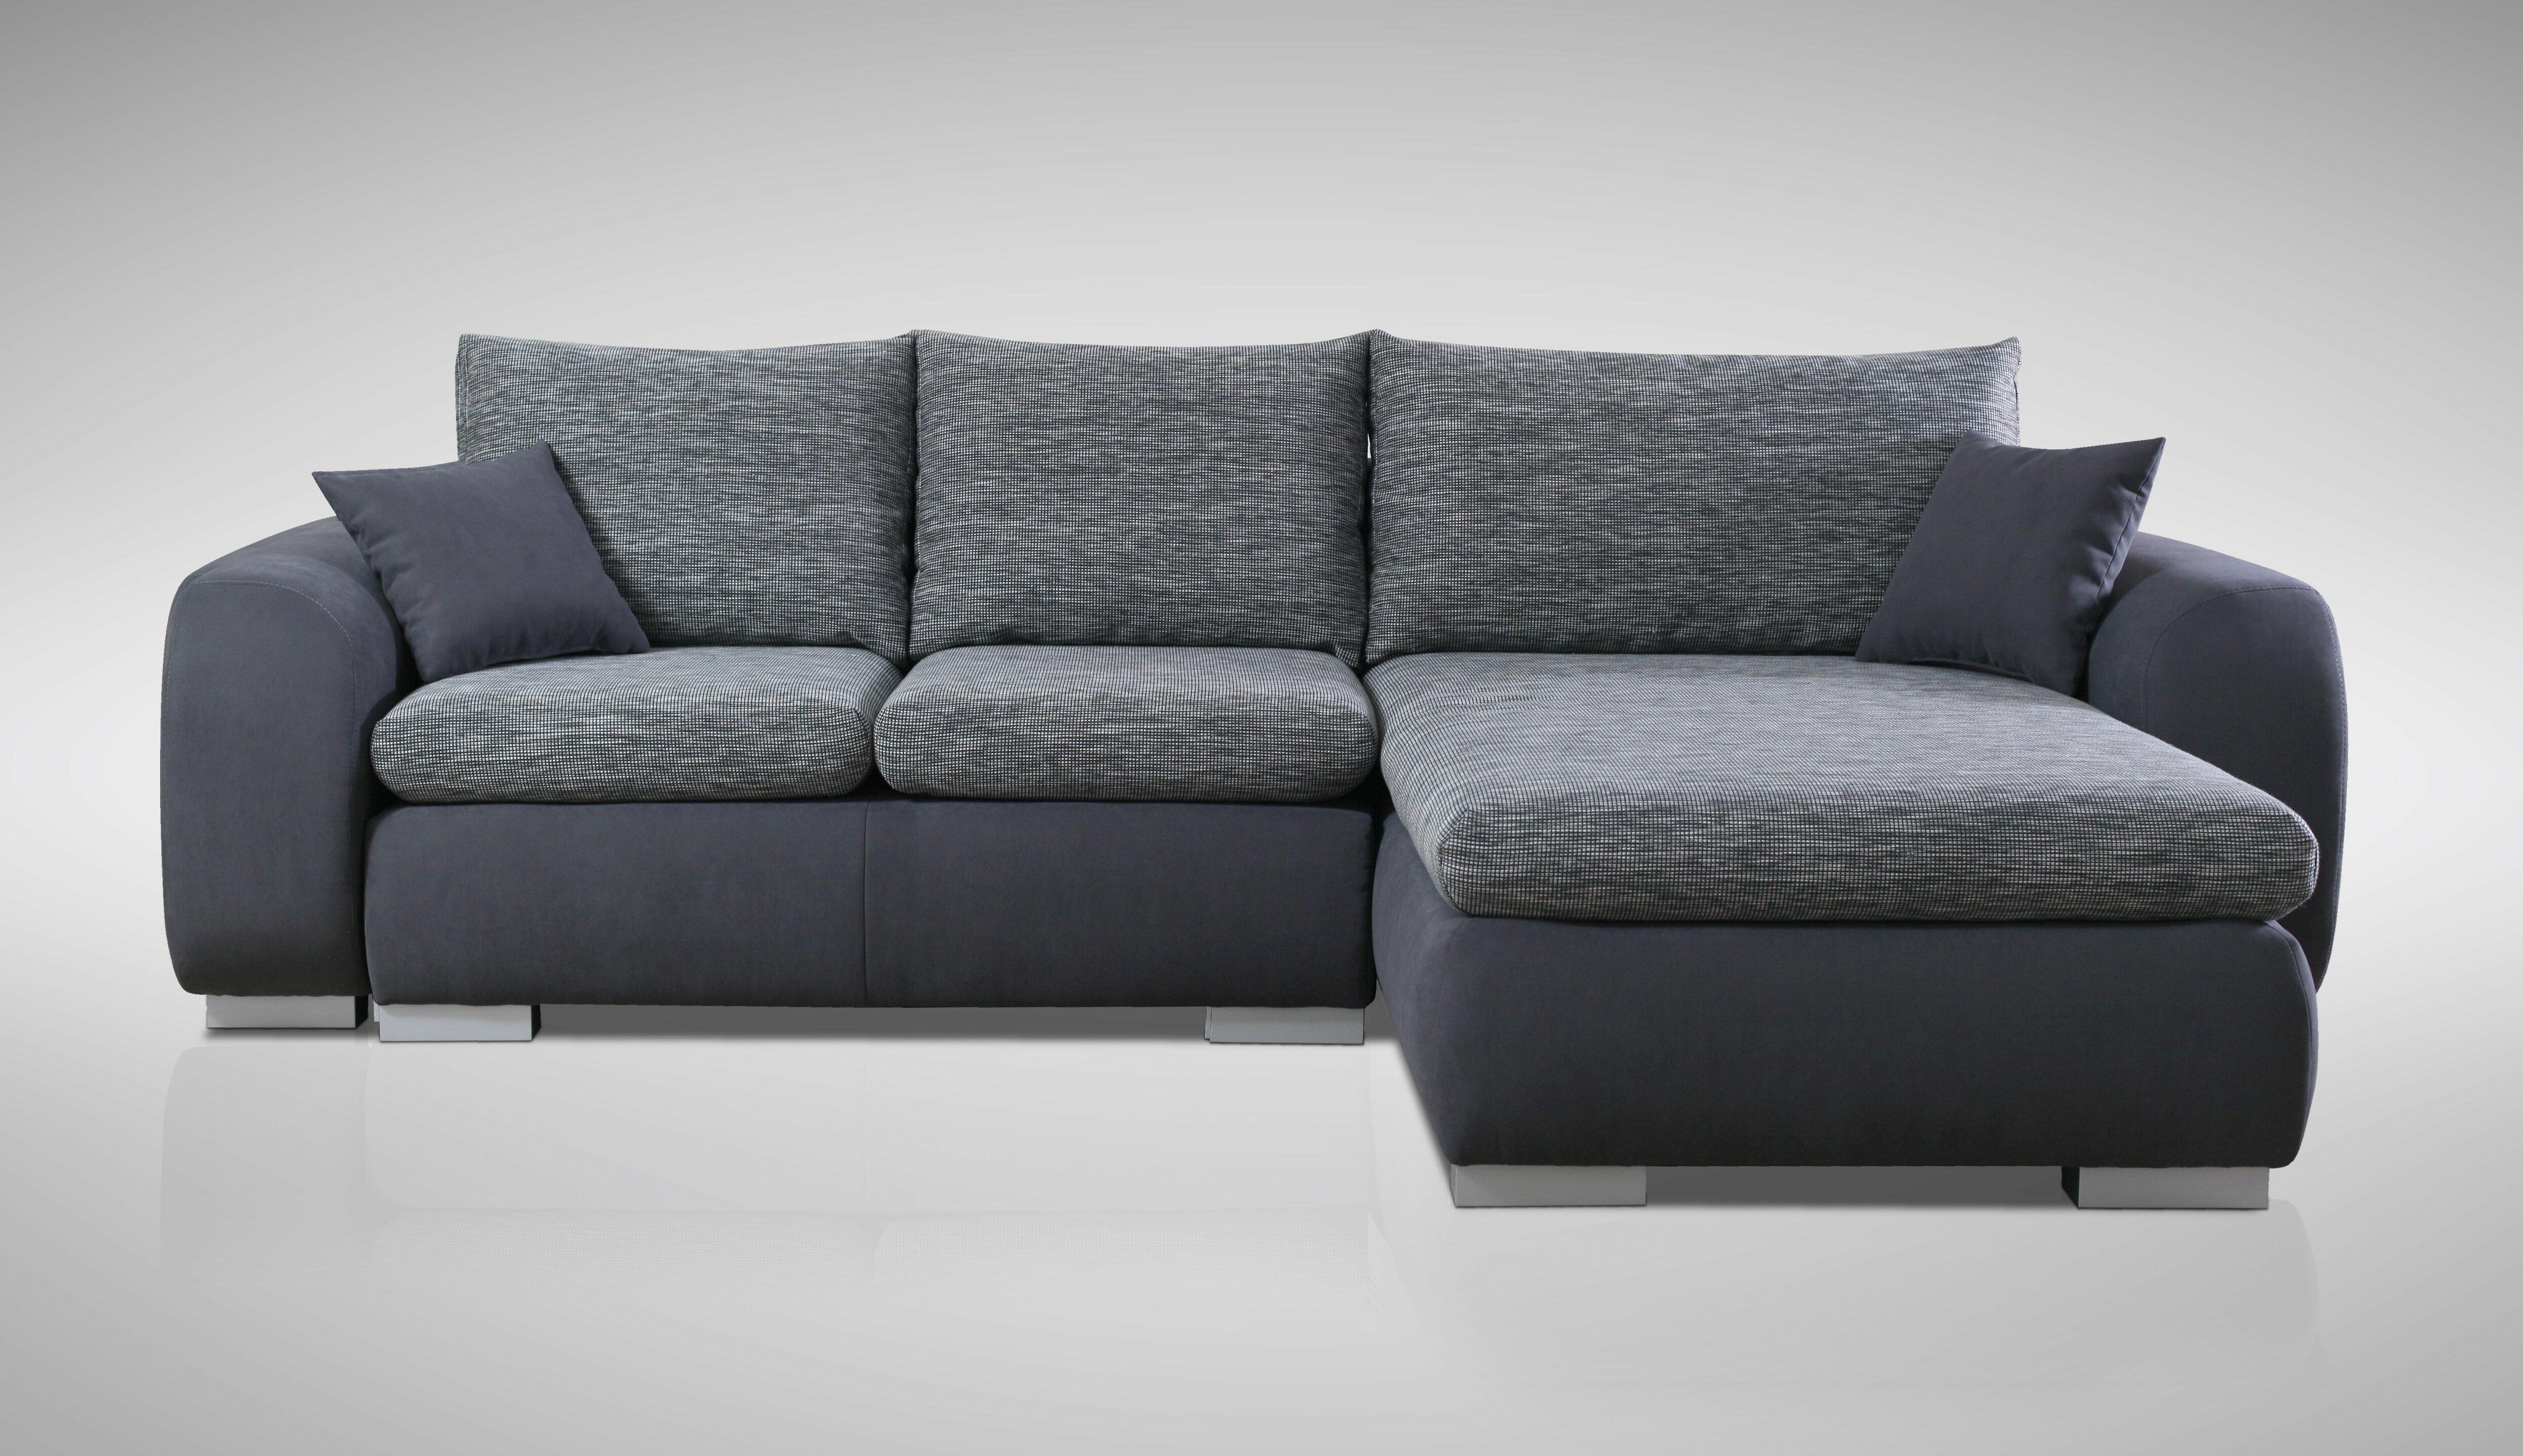 Ebern Designs Aysen Corner Sofa Bed